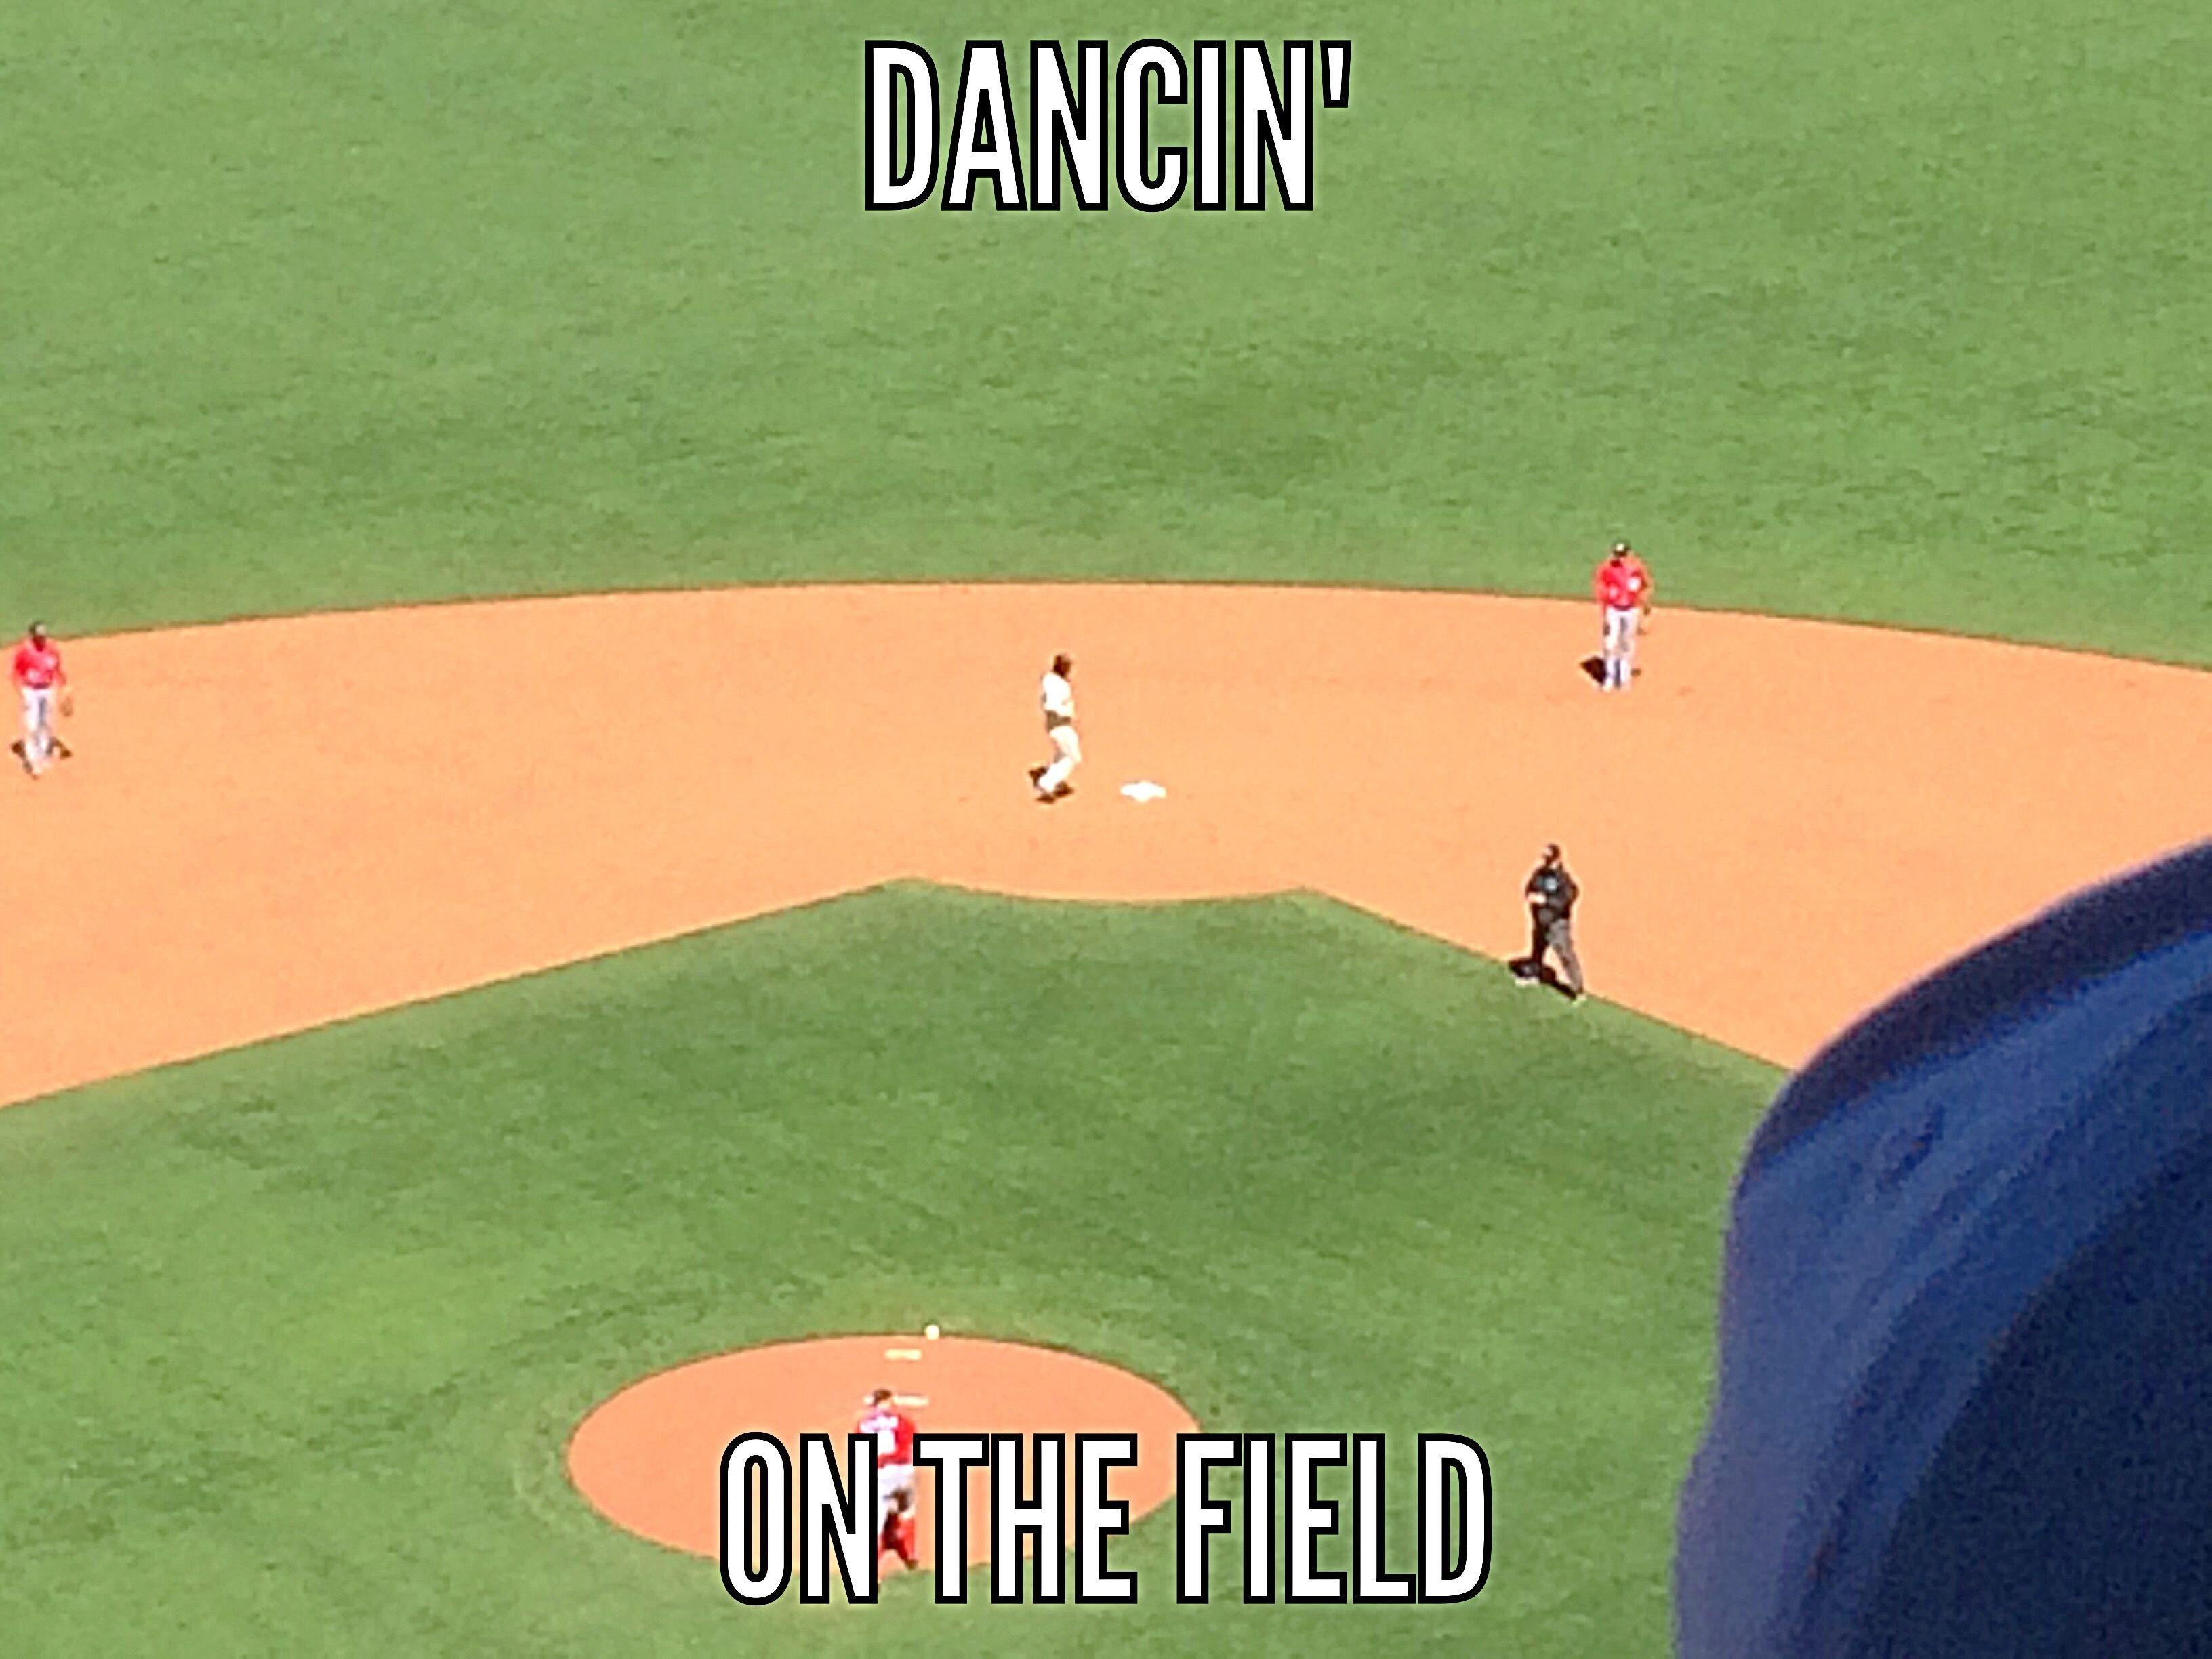 Pin by Ethan Harrison Barnes on Funny stuff   Baseball ...